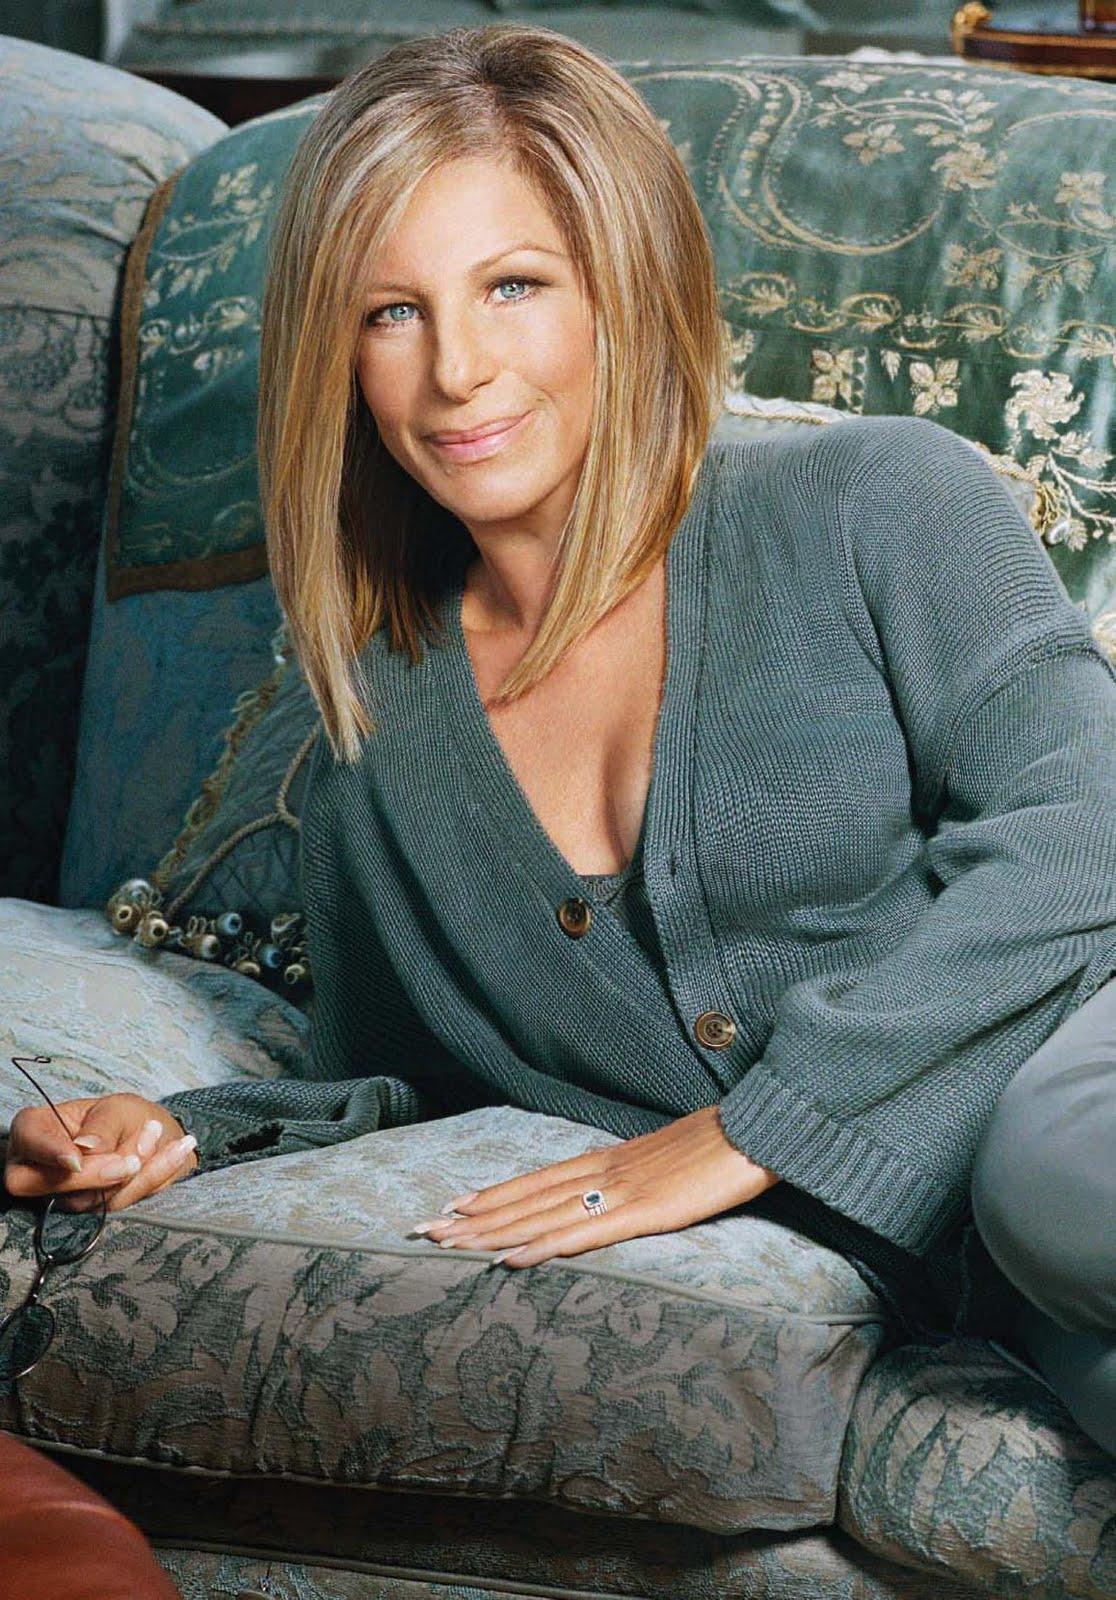 http://4.bp.blogspot.com/-U1-NmWXhxmY/TeE9RxdX22I/AAAAAAAAEcg/c0COR0jxjSU/s1600/Barbra-Streisand-barbra-streisand-8952593-1158-1660.jpg